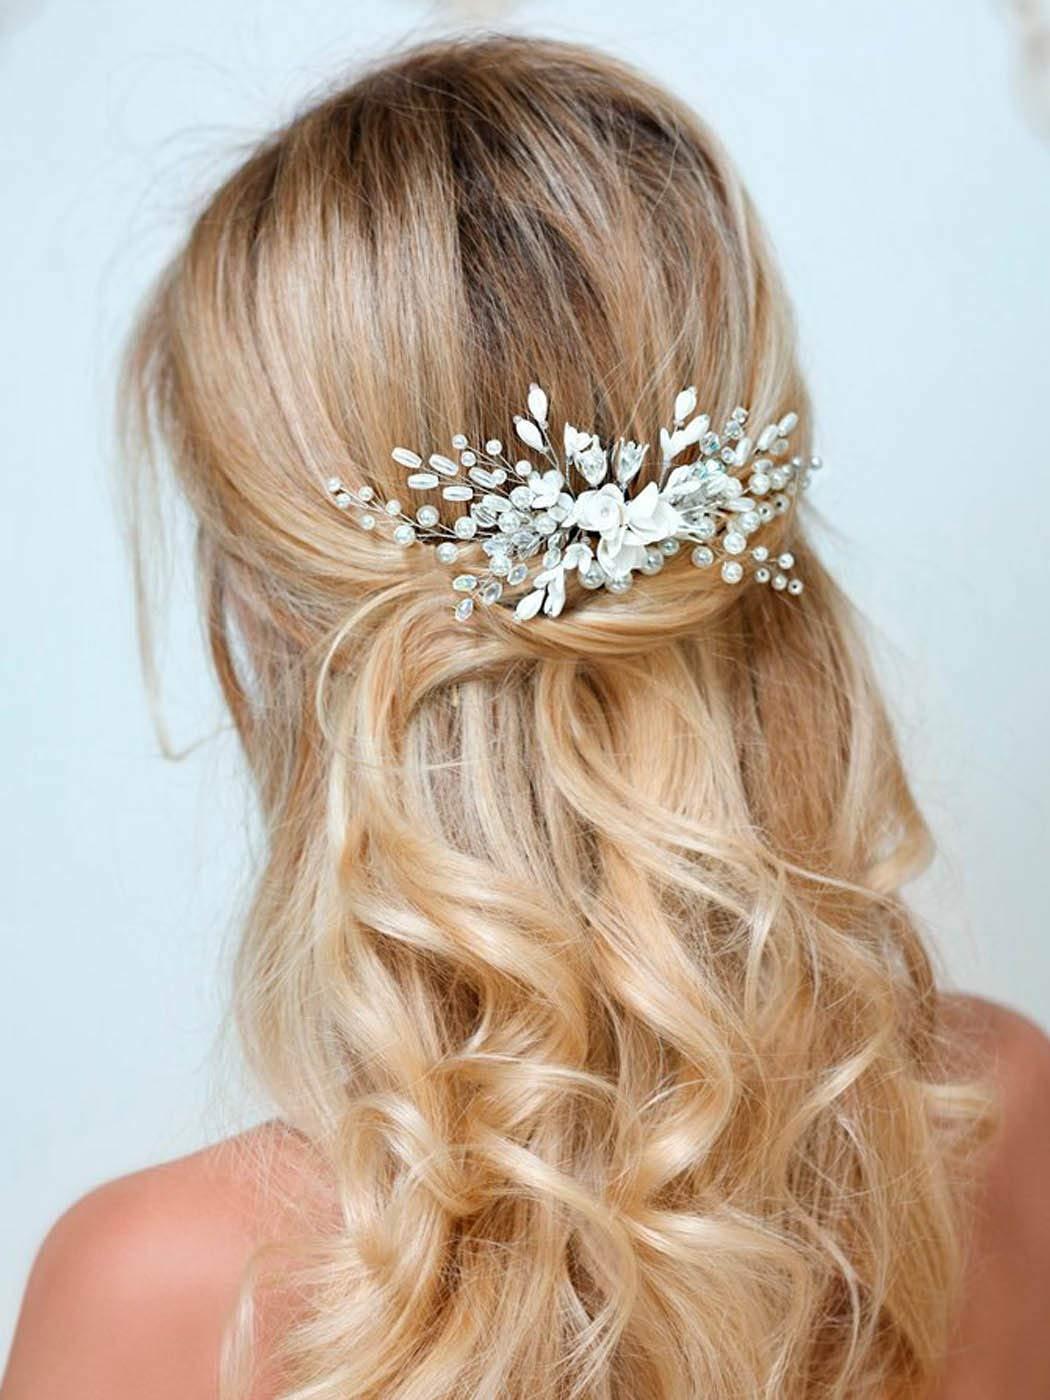 Barogirl Wedding White Flower Hair Comb Clip Crystal Bride Hair Piece Bridal Hair Accessories for Women by Barogirl